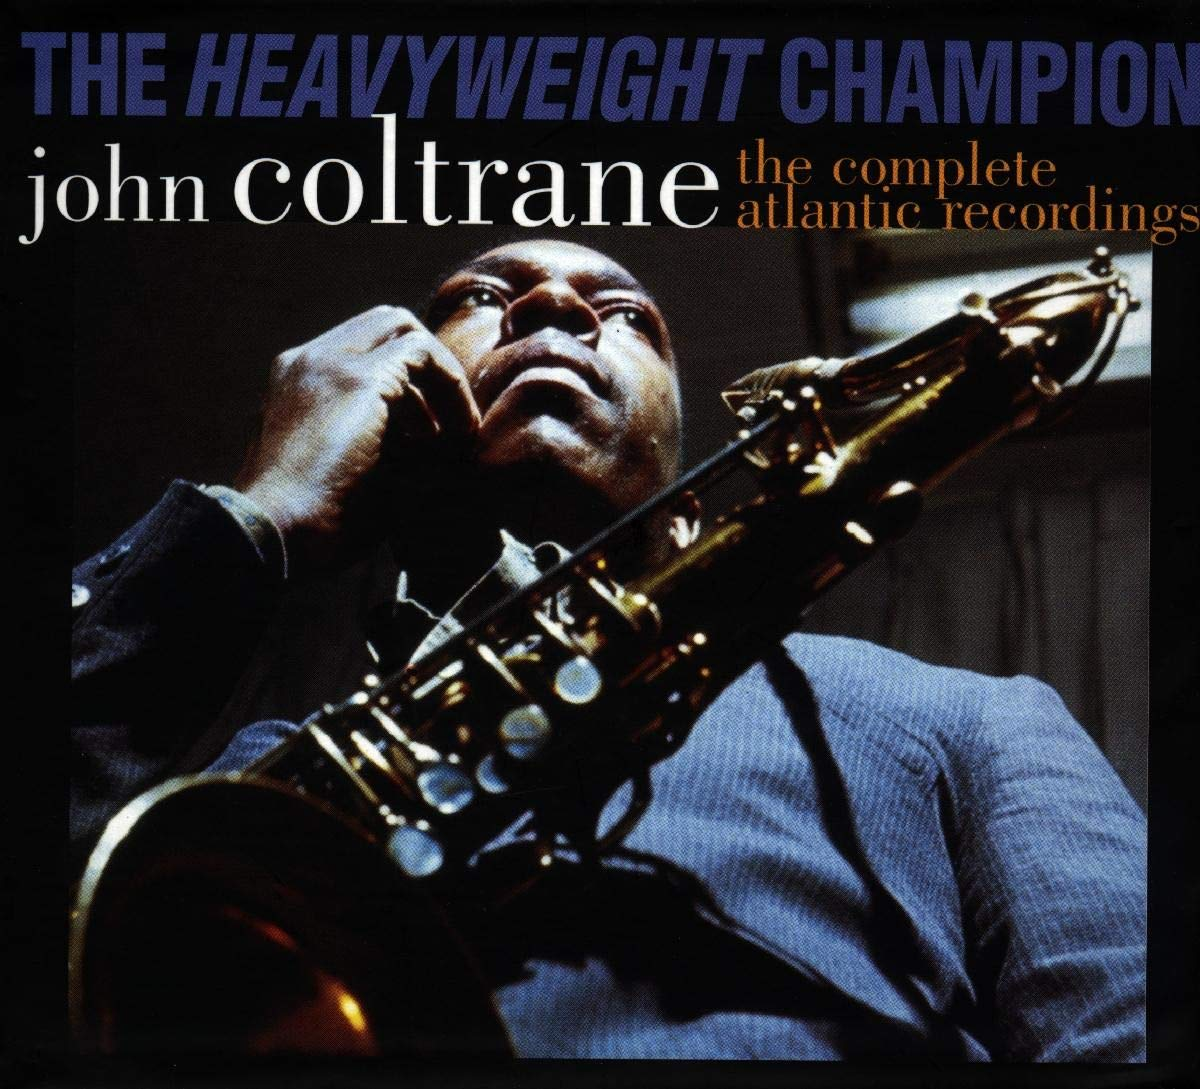 The Heavyweight Champion: The Complete Atlantic Recordings of John Coltrane by Atlantic